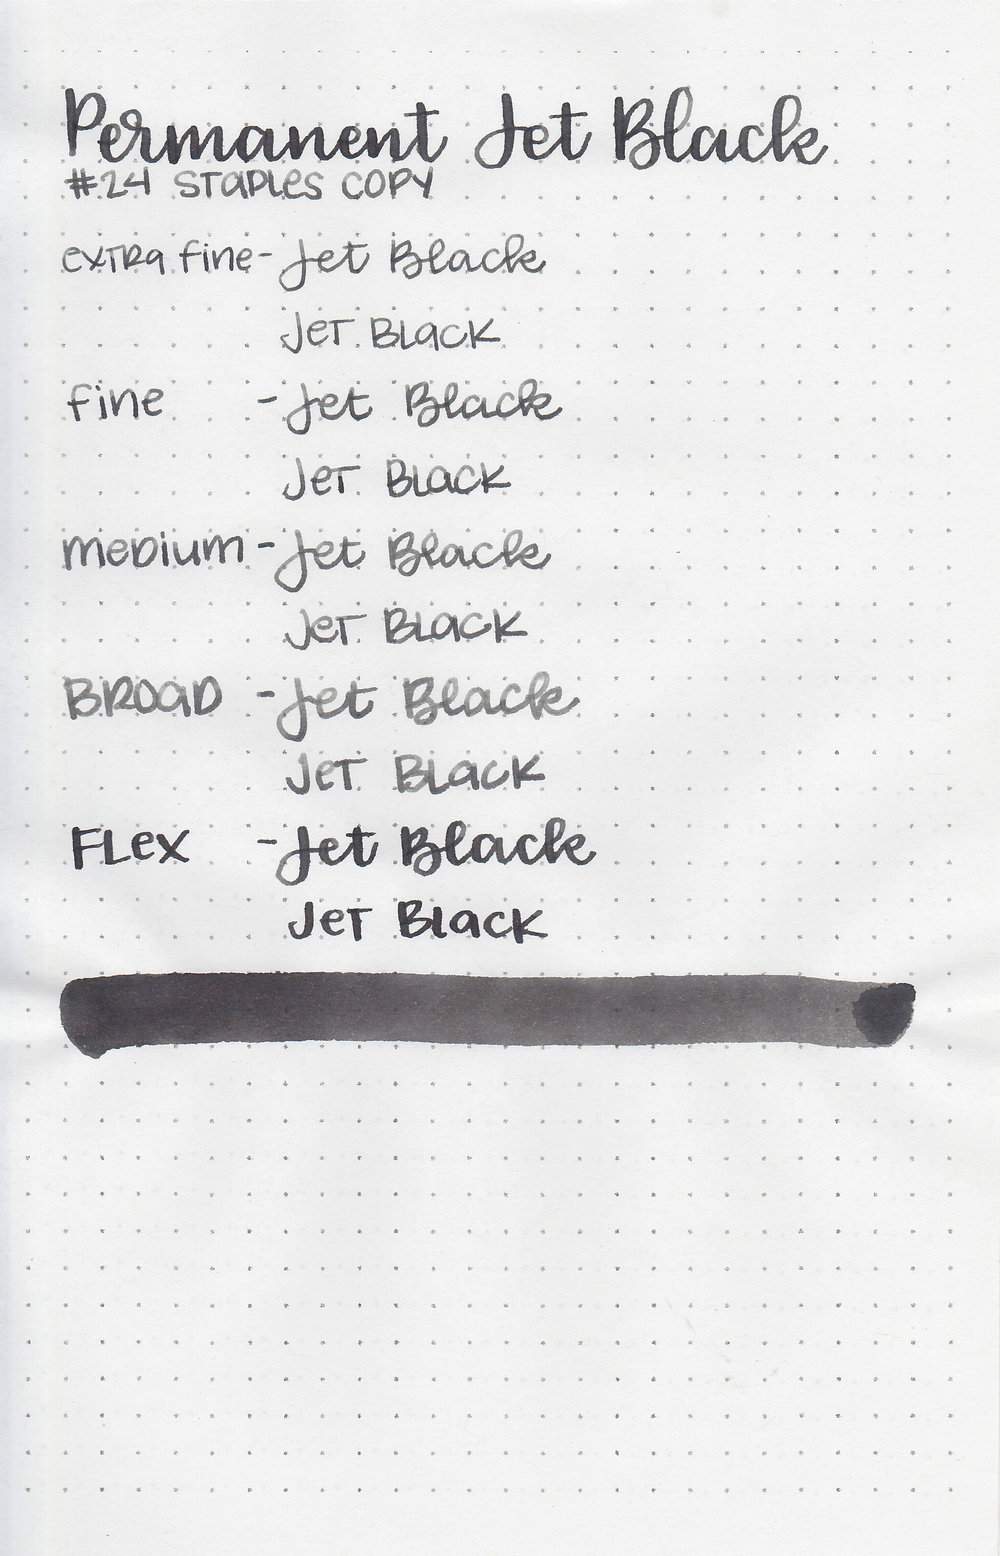 shea-perm-jet-black-11.jpg